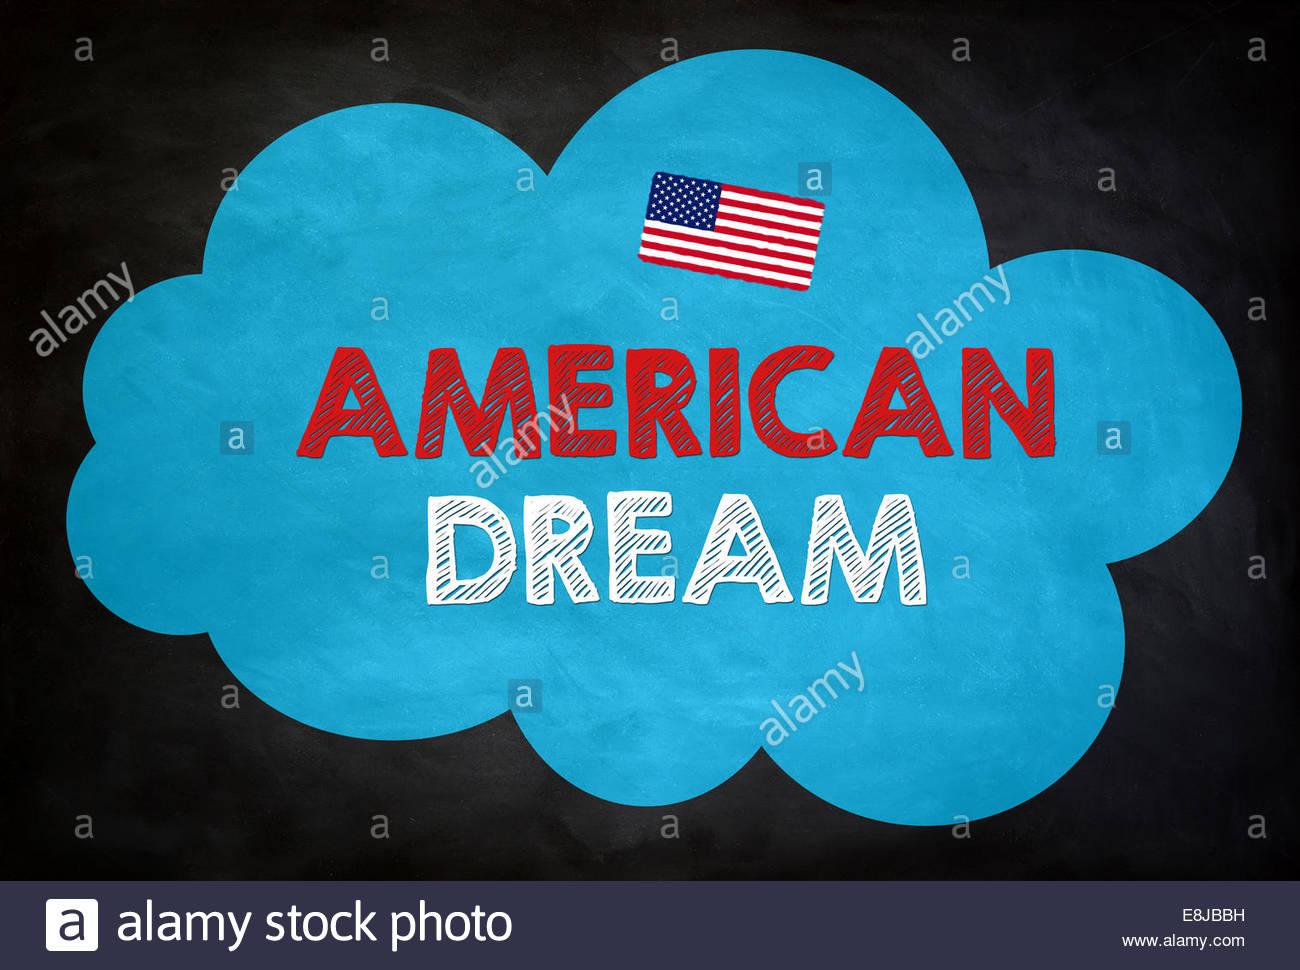 AMERICAN DREAM - chalkboard concept - Stock Image